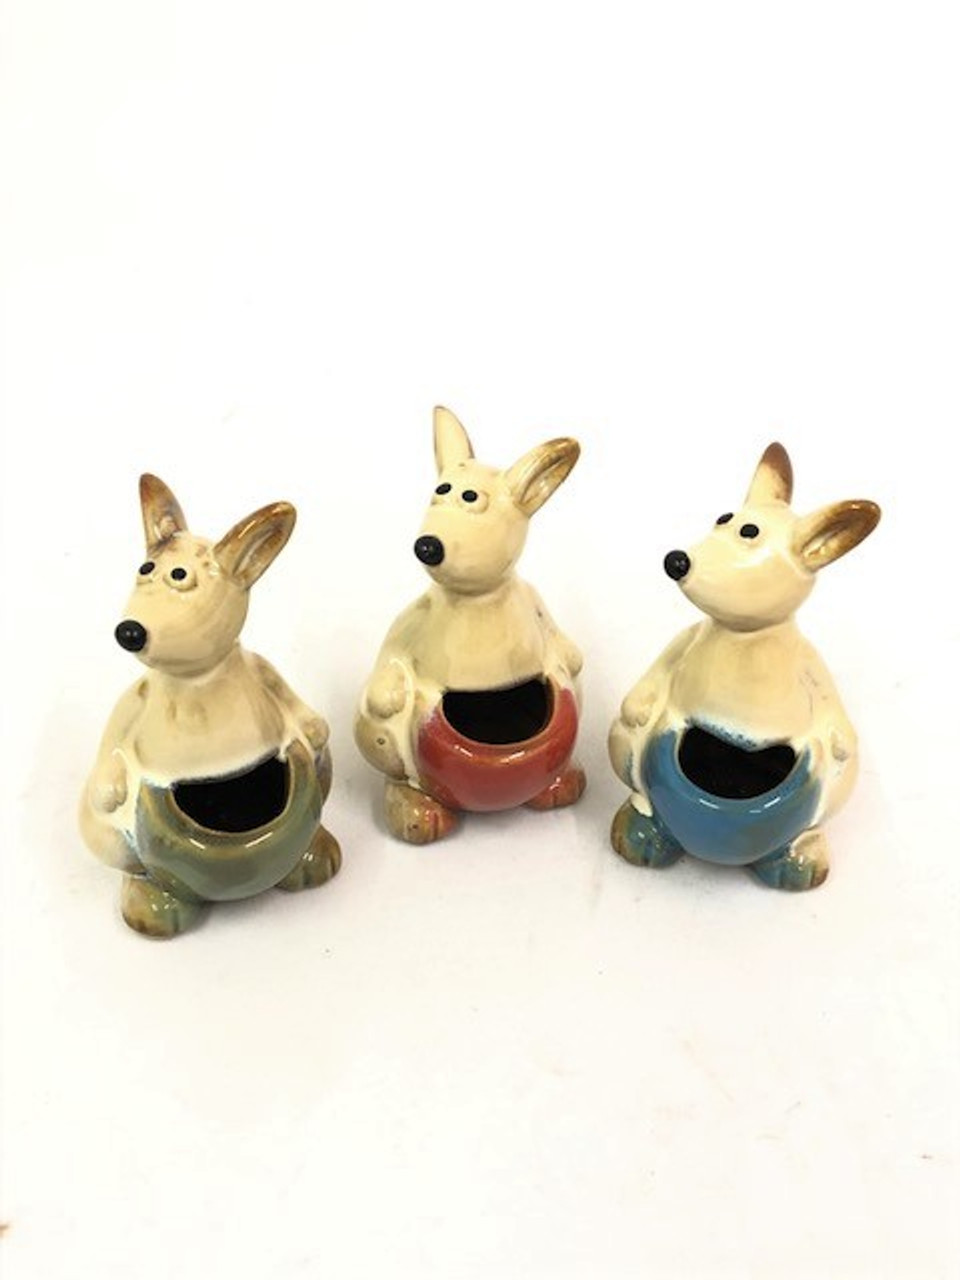 Kangaroo Toothpick Holder - Set of 3 (9cm high) Beautifully designed Ceramic (SET OF 3) Kangaroo Toothpick Holders